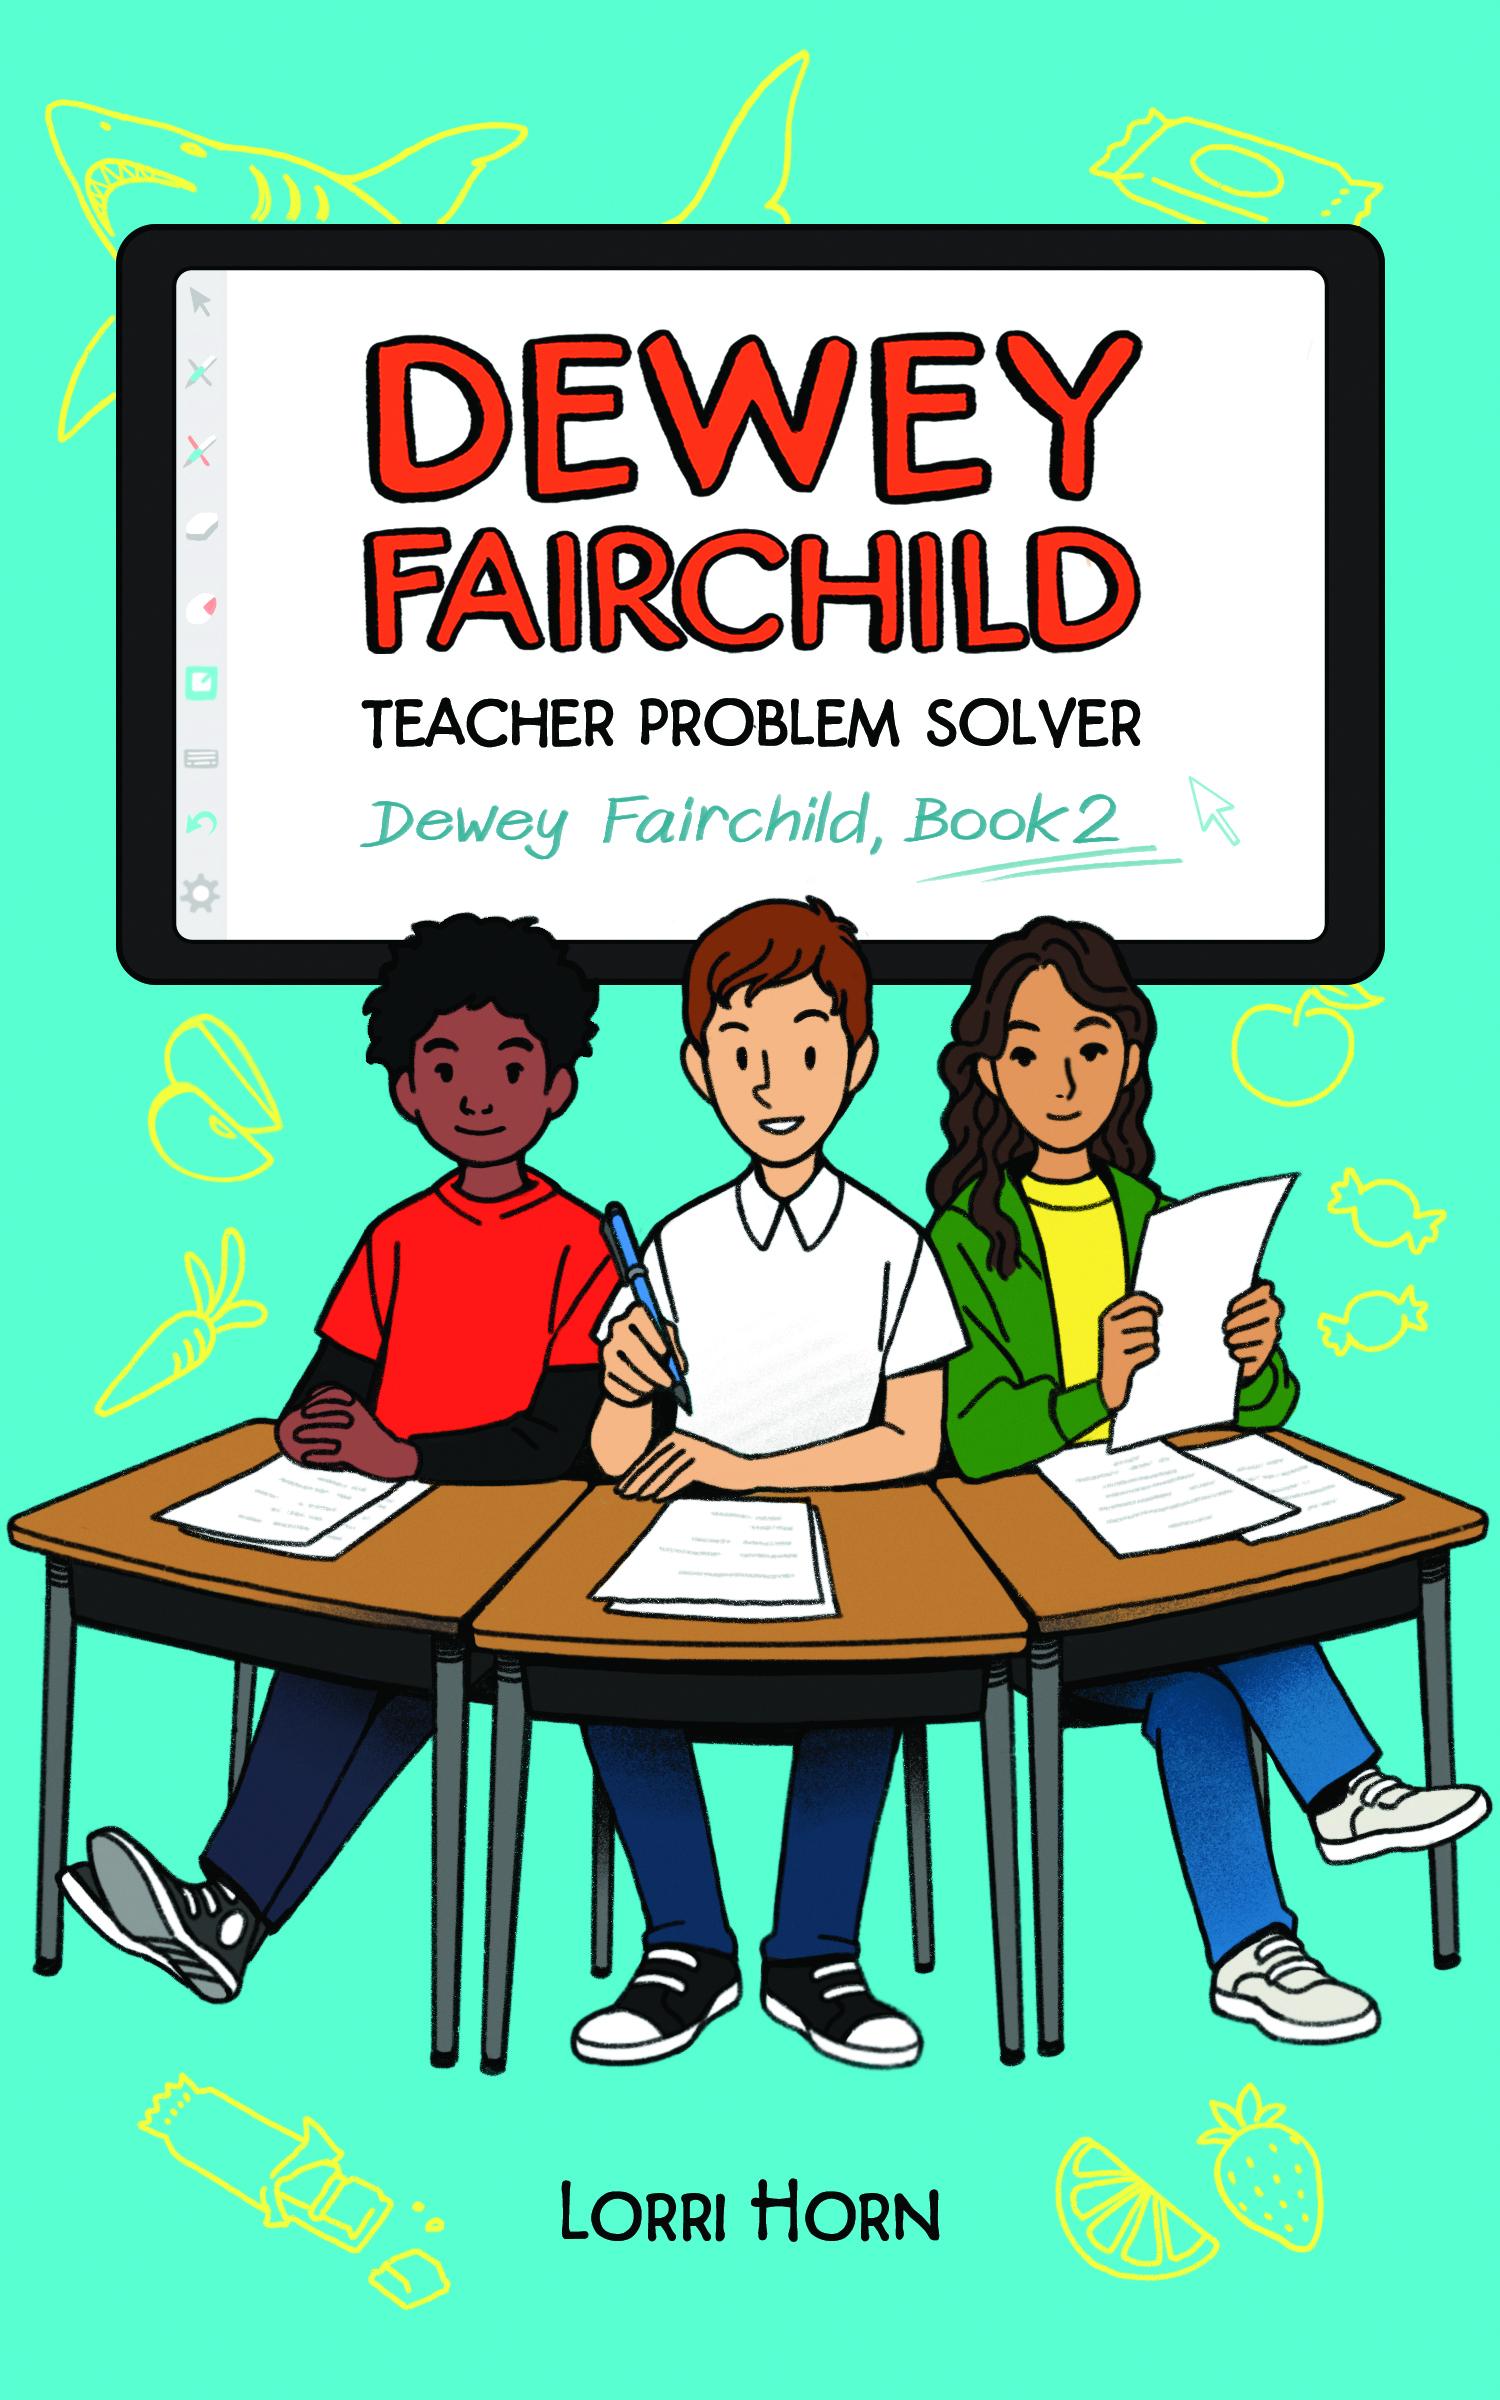 Horn Lorri DEWEY FAIRCHILD TEACHER PROBLEM SOLVER retail cover 2D version 20180928.jpg